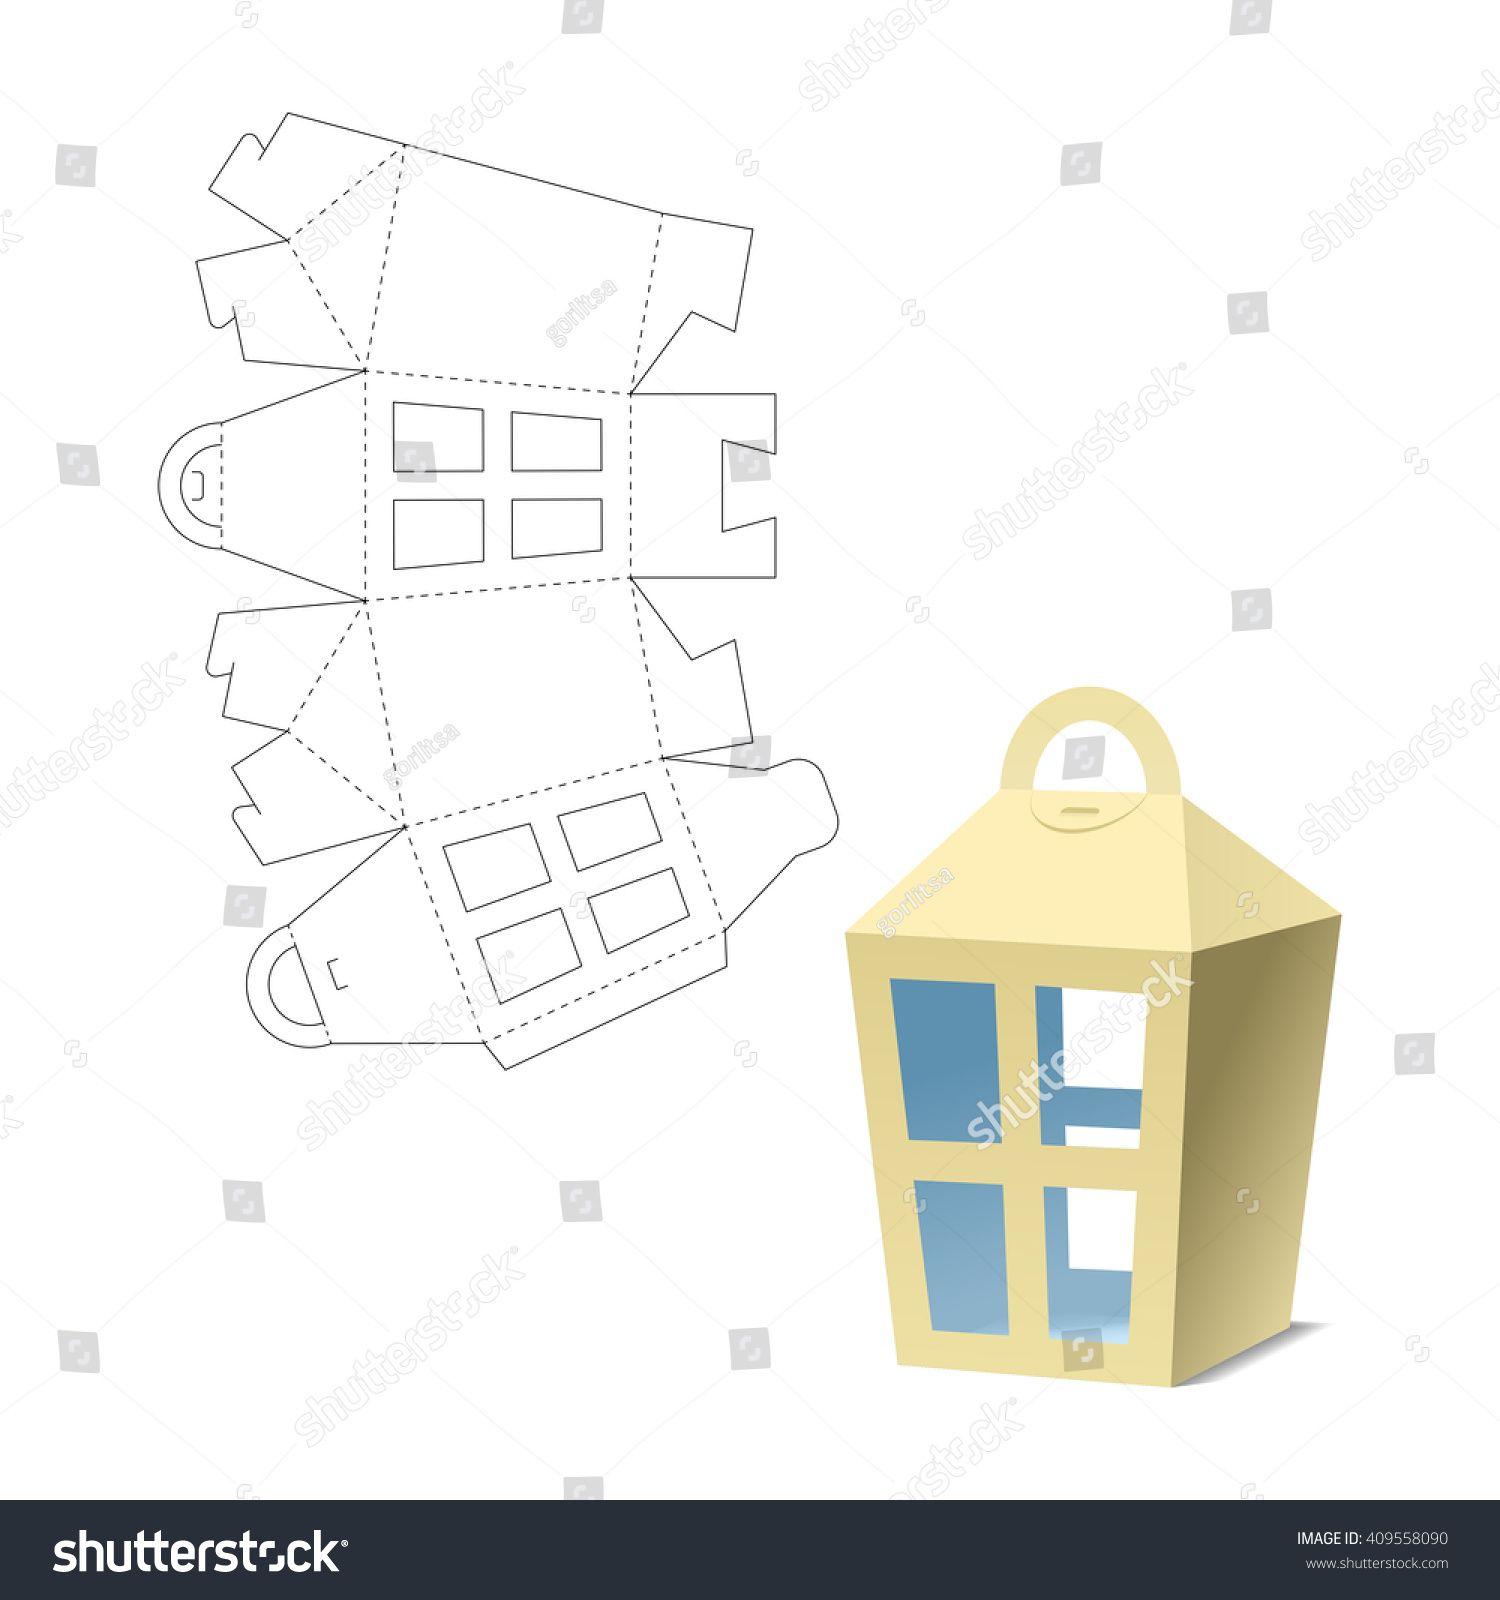 Pin by Kaixan Chen on Templates | Retail box, Origami Box ... - photo#38